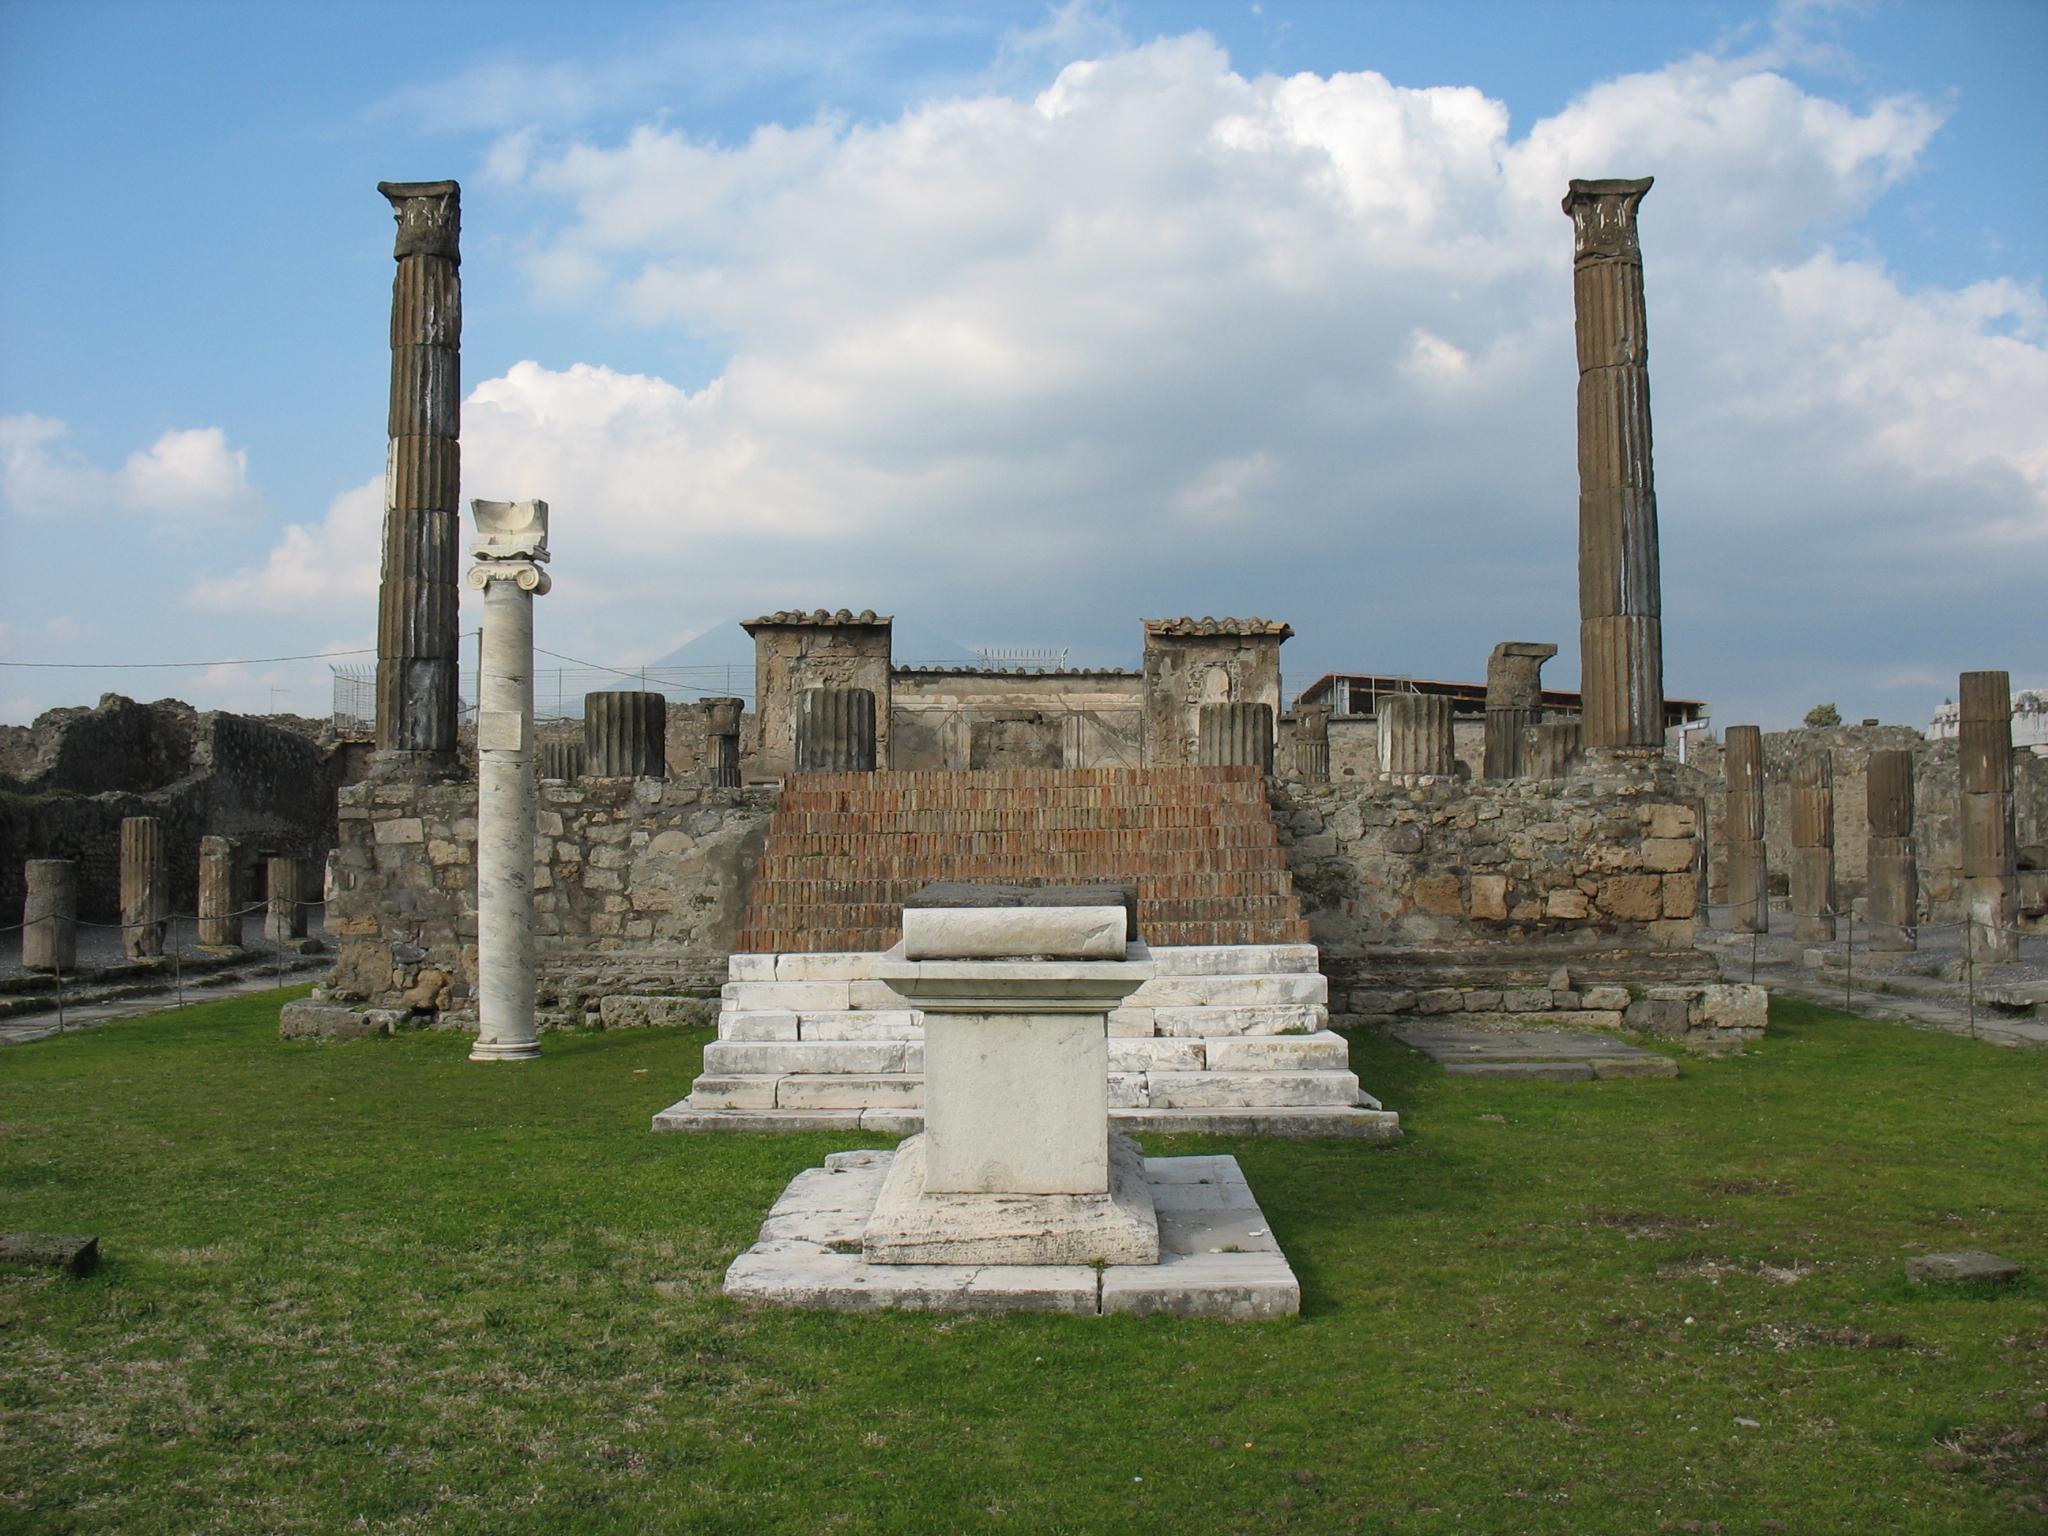 File:Pompeii - Temple of Apollo.jpg - Wikimedia Commons